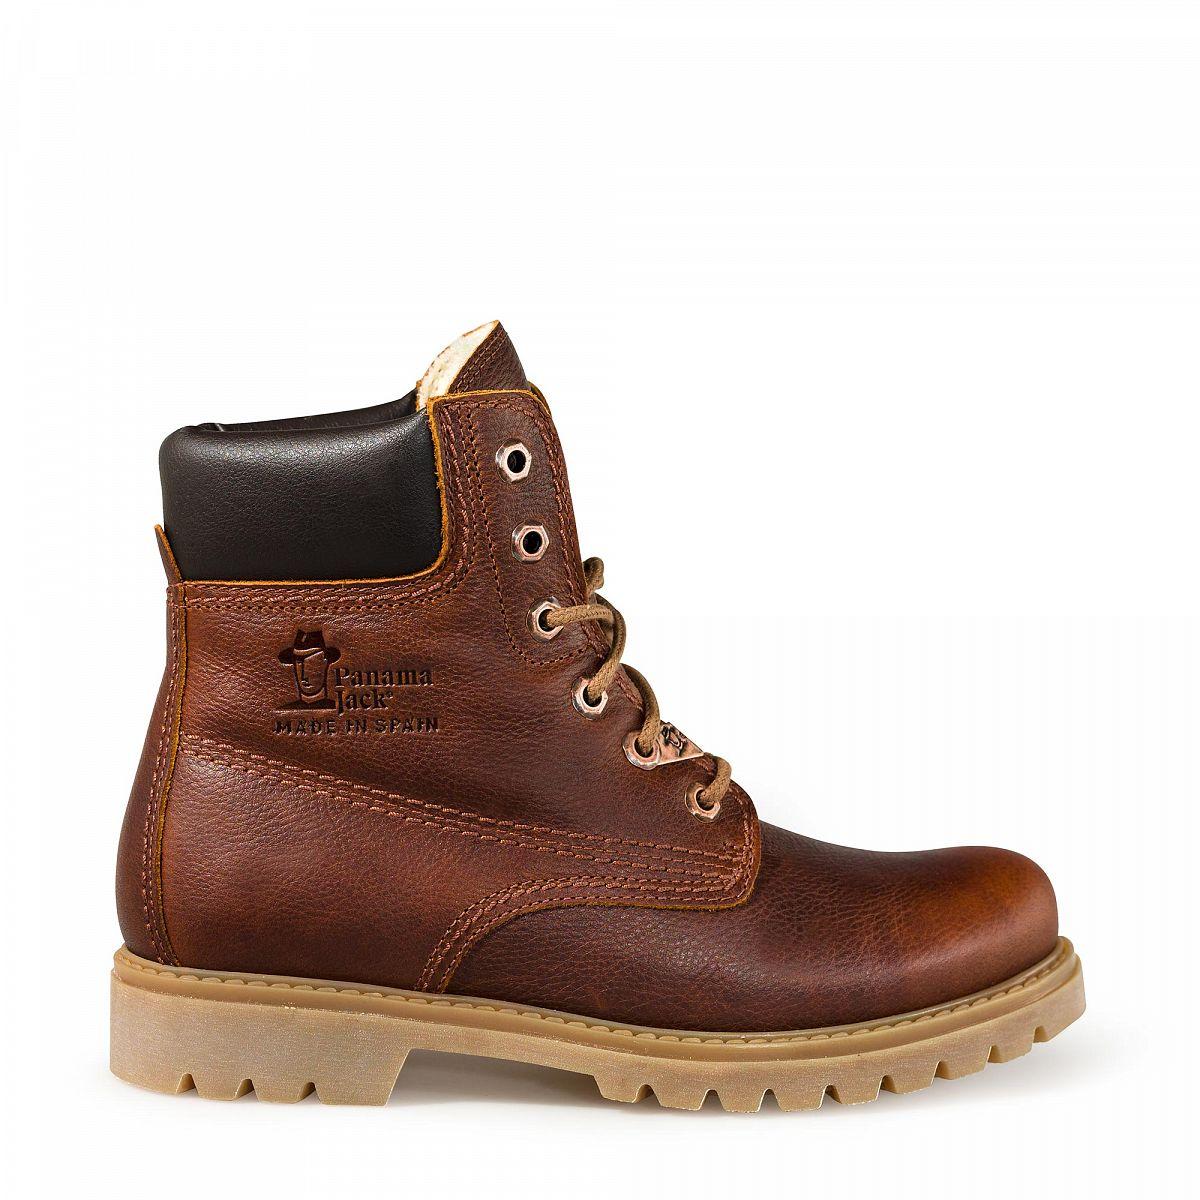 womens boots panama 03 wool bark panama jack shop. Black Bedroom Furniture Sets. Home Design Ideas